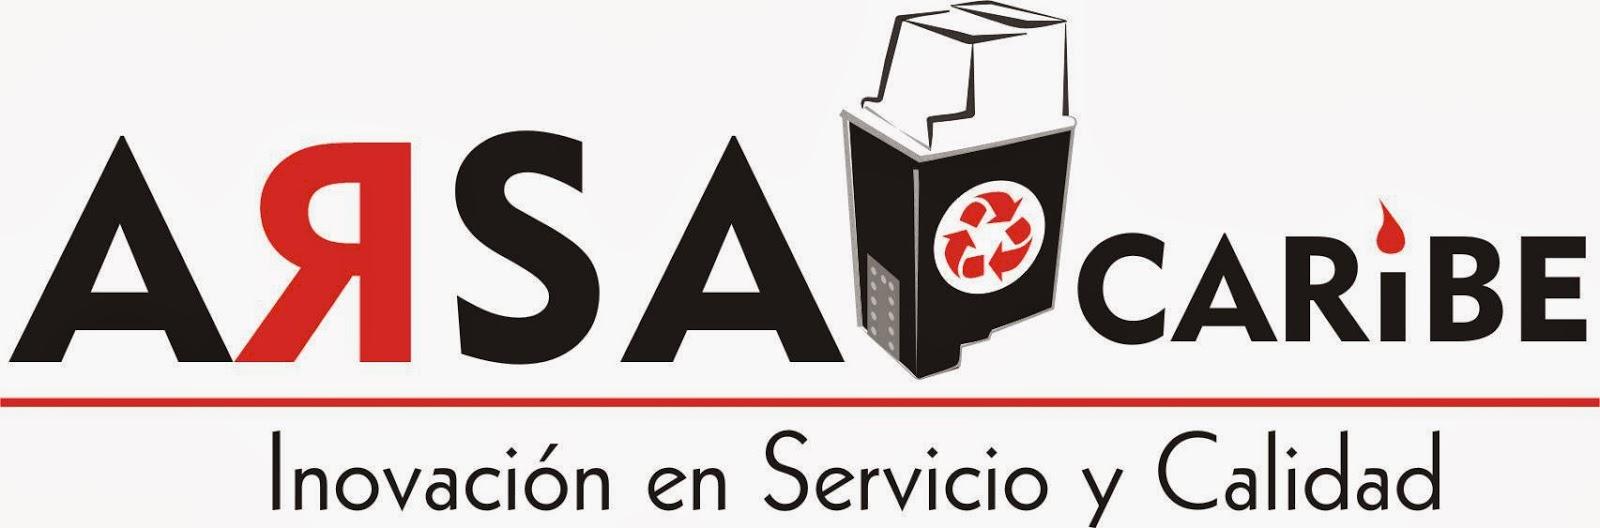 arsa caribe logotipo